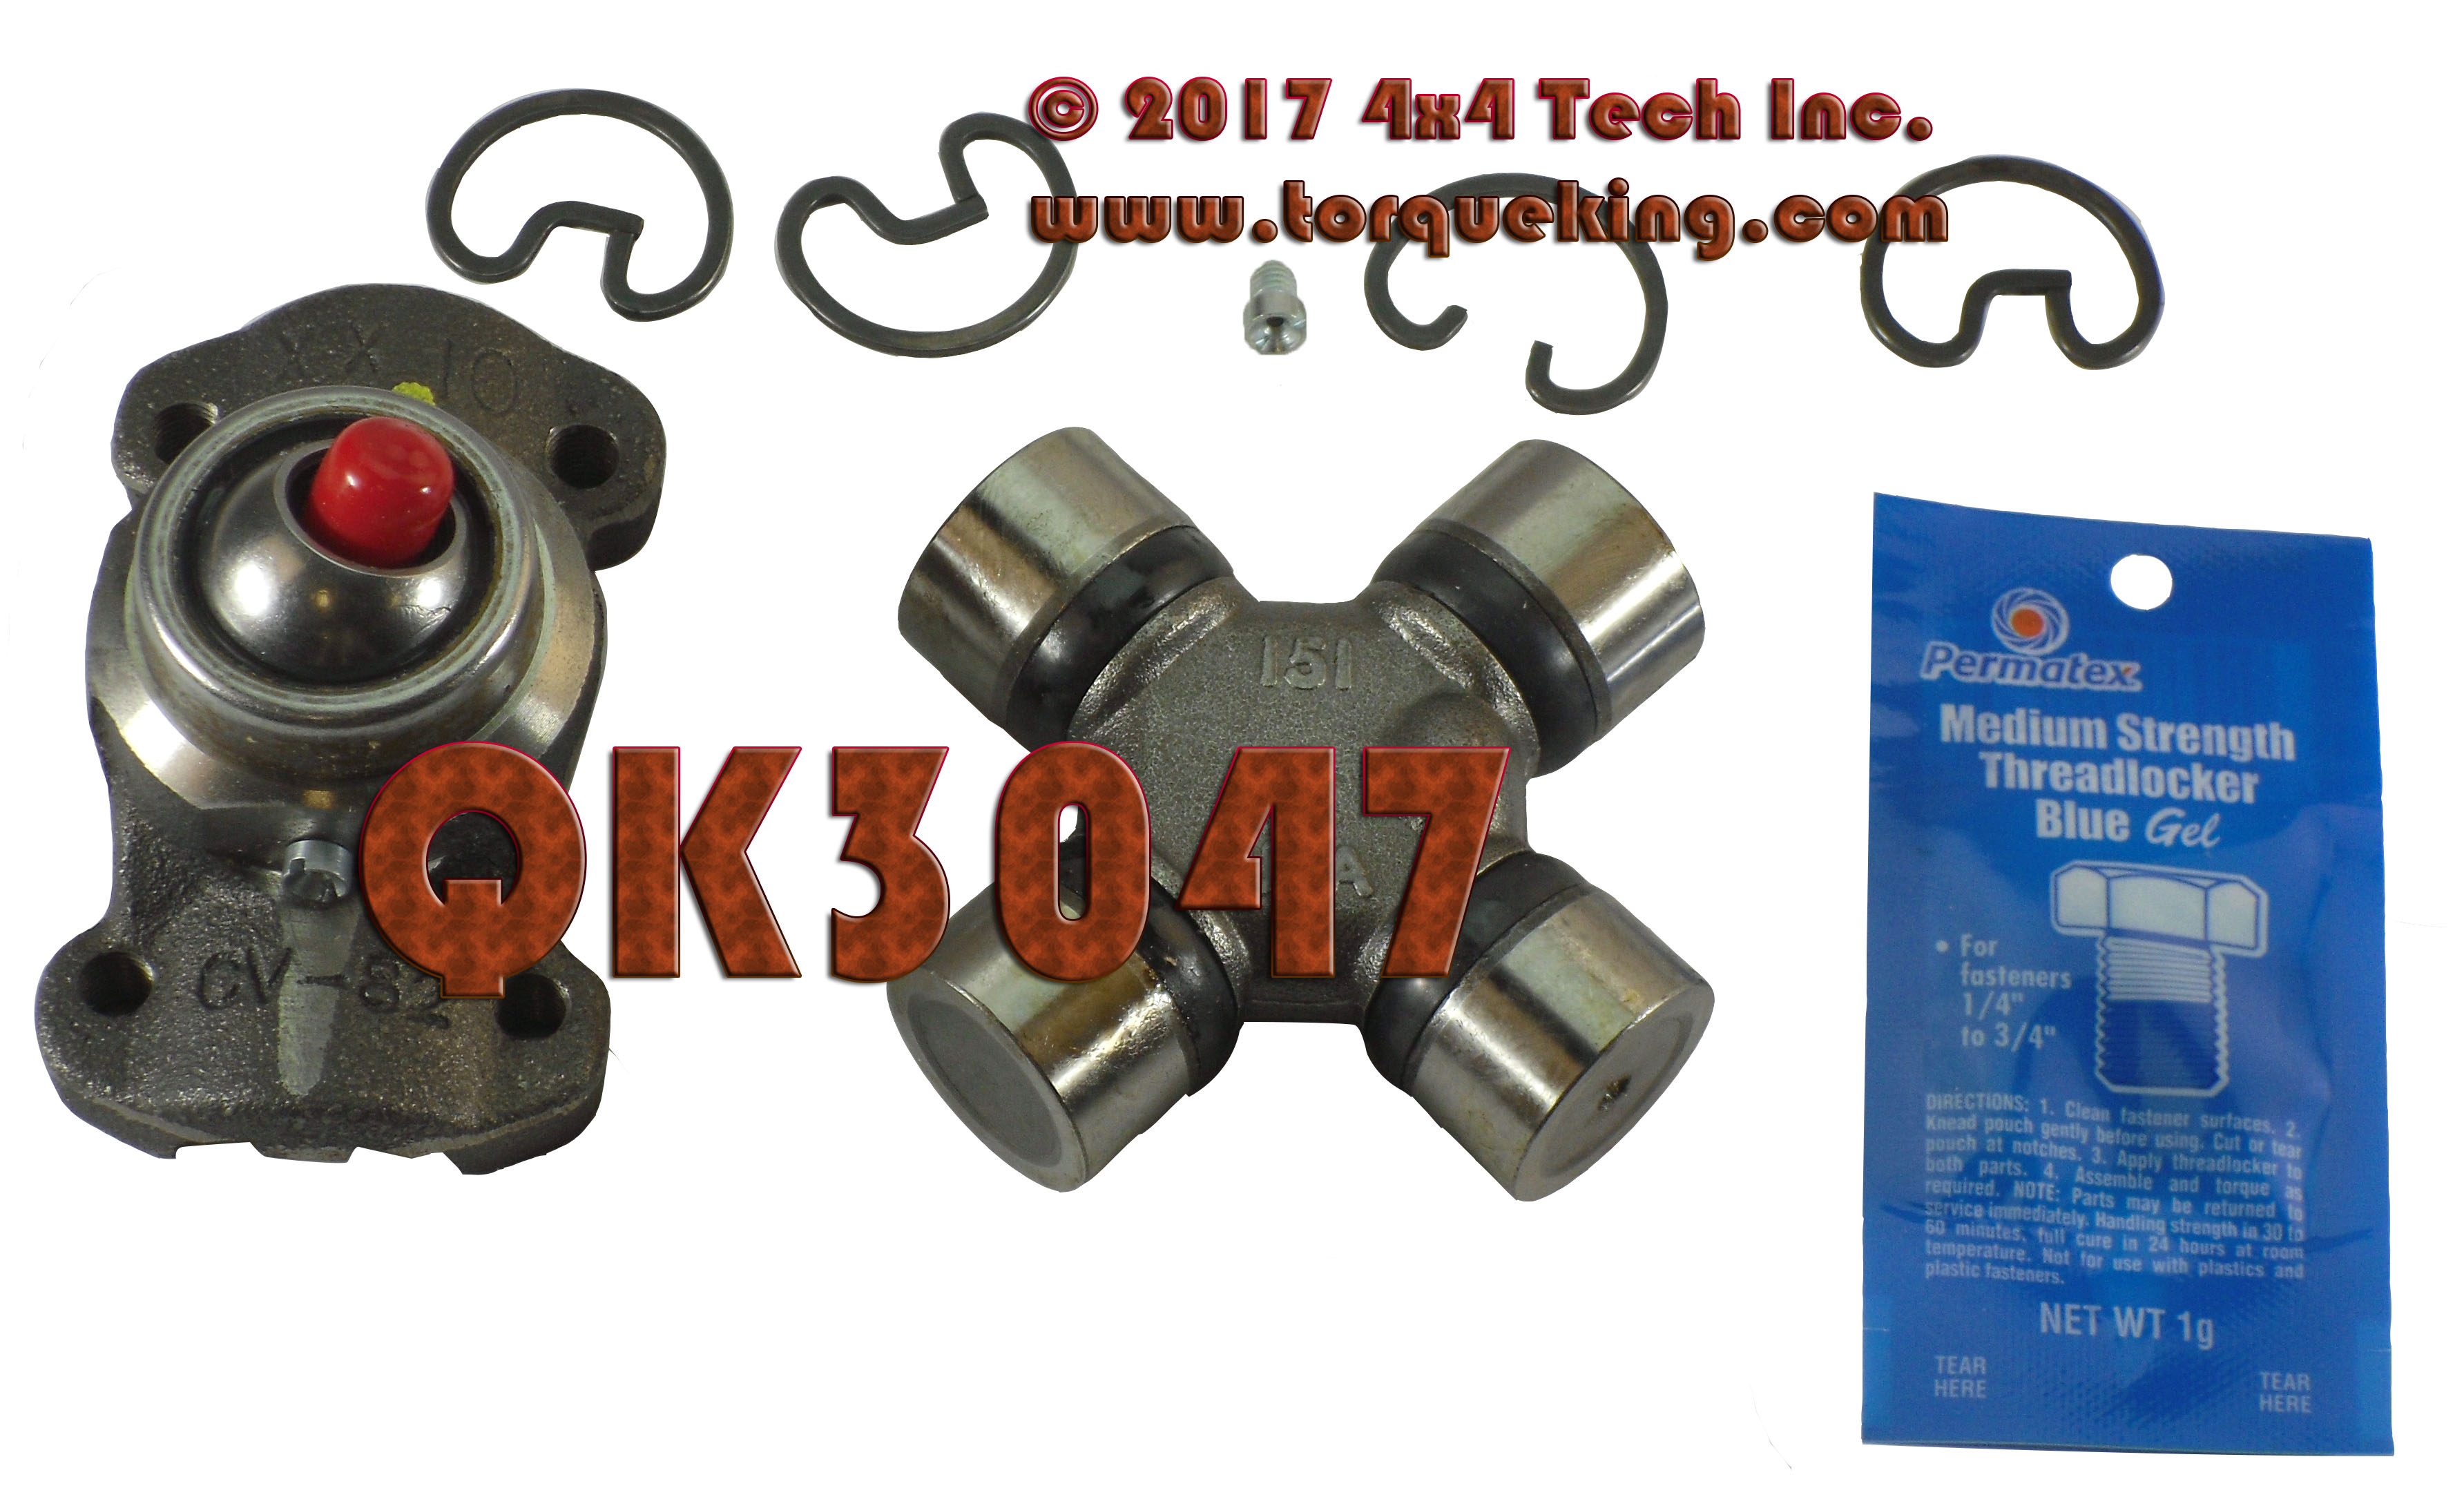 qk3047 - Torque King 4x4